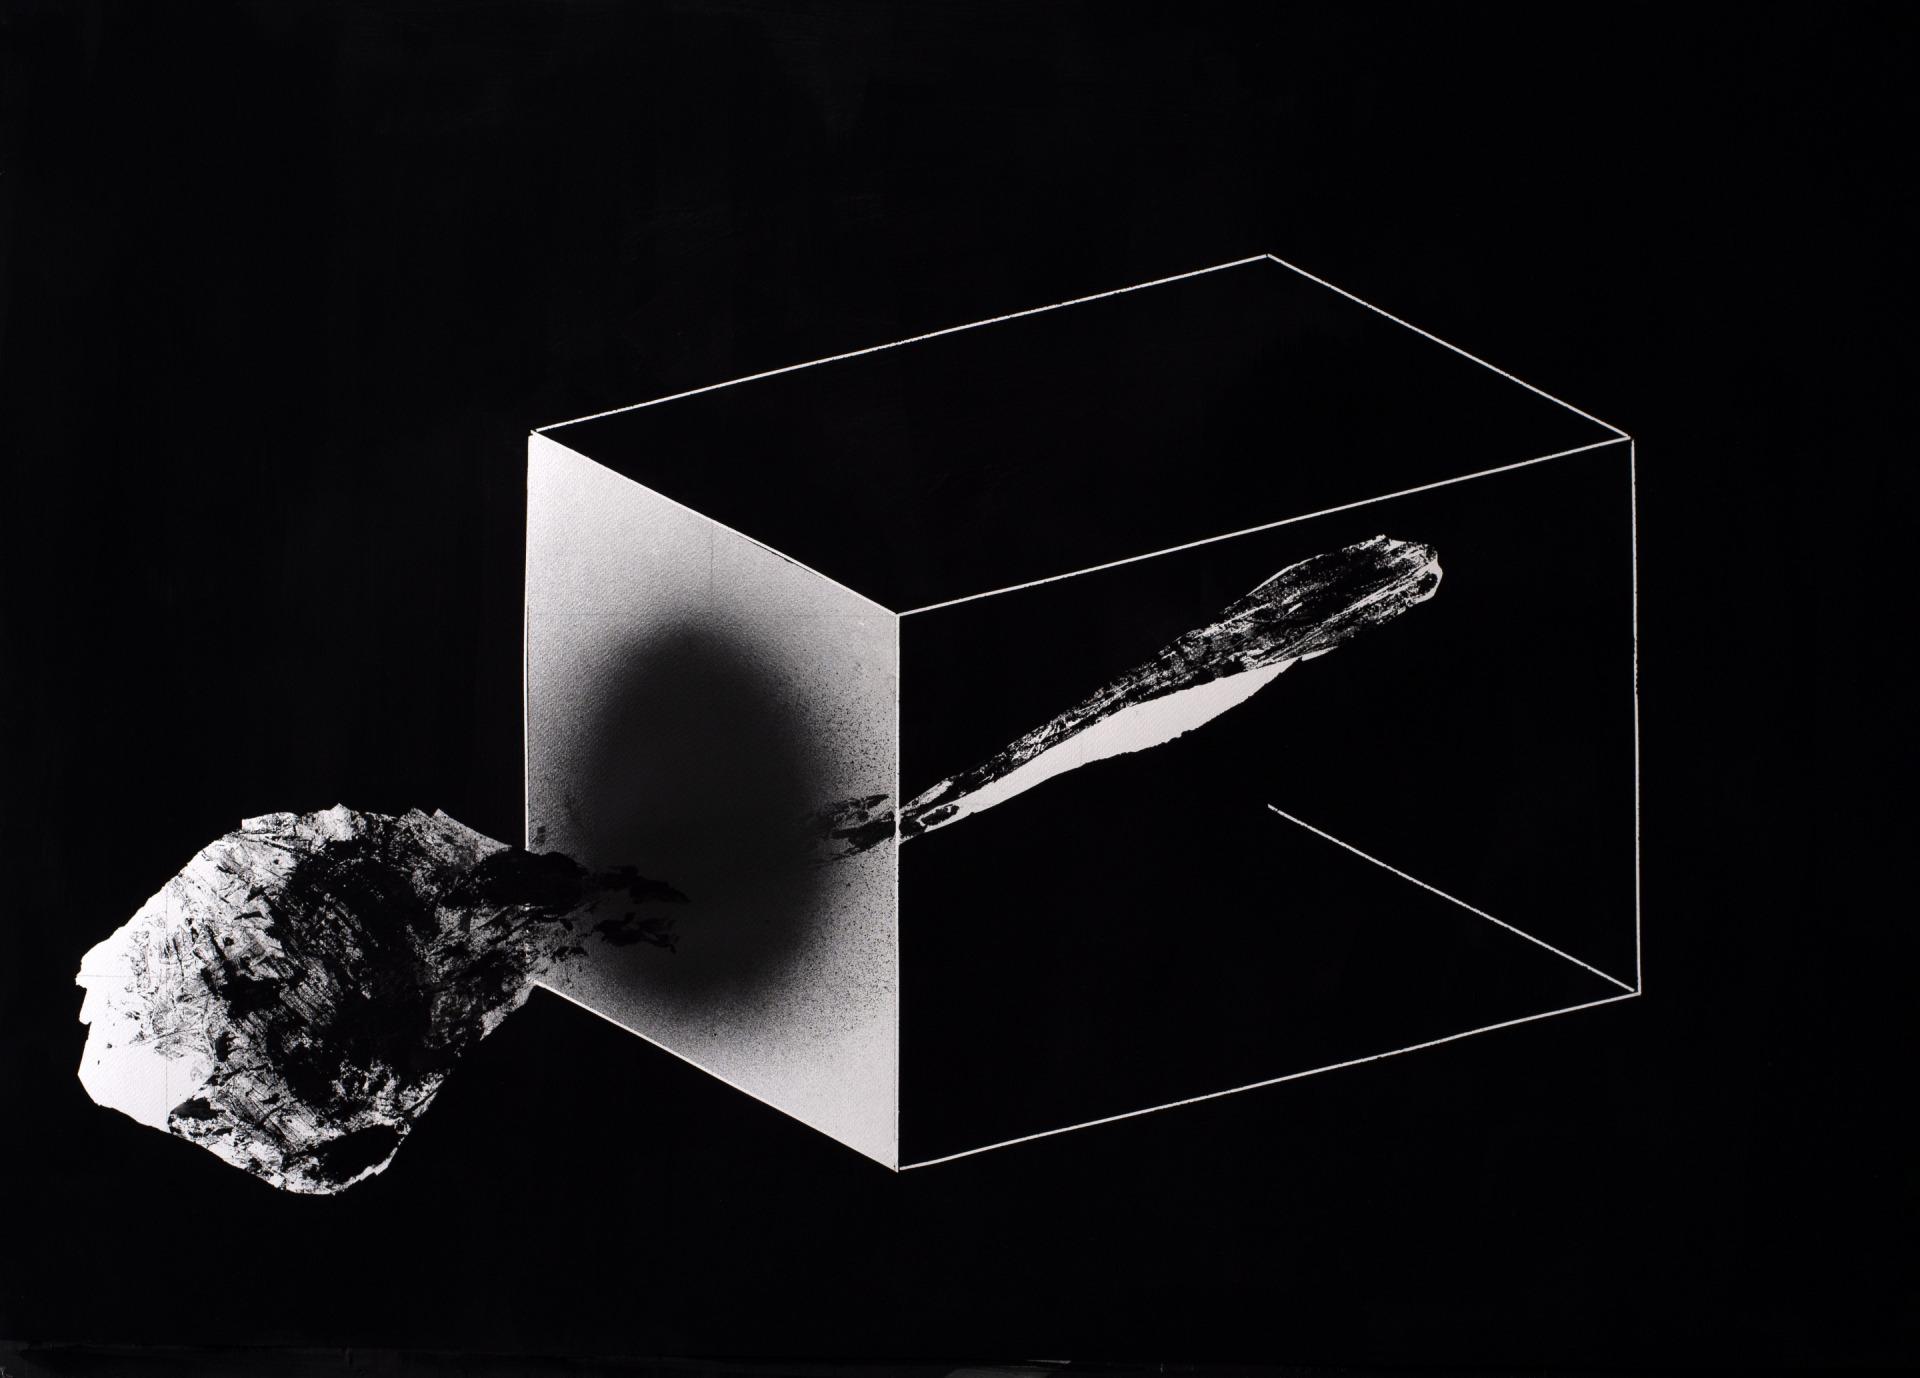 Contemporary art from Gyula Sági | op210321. 8